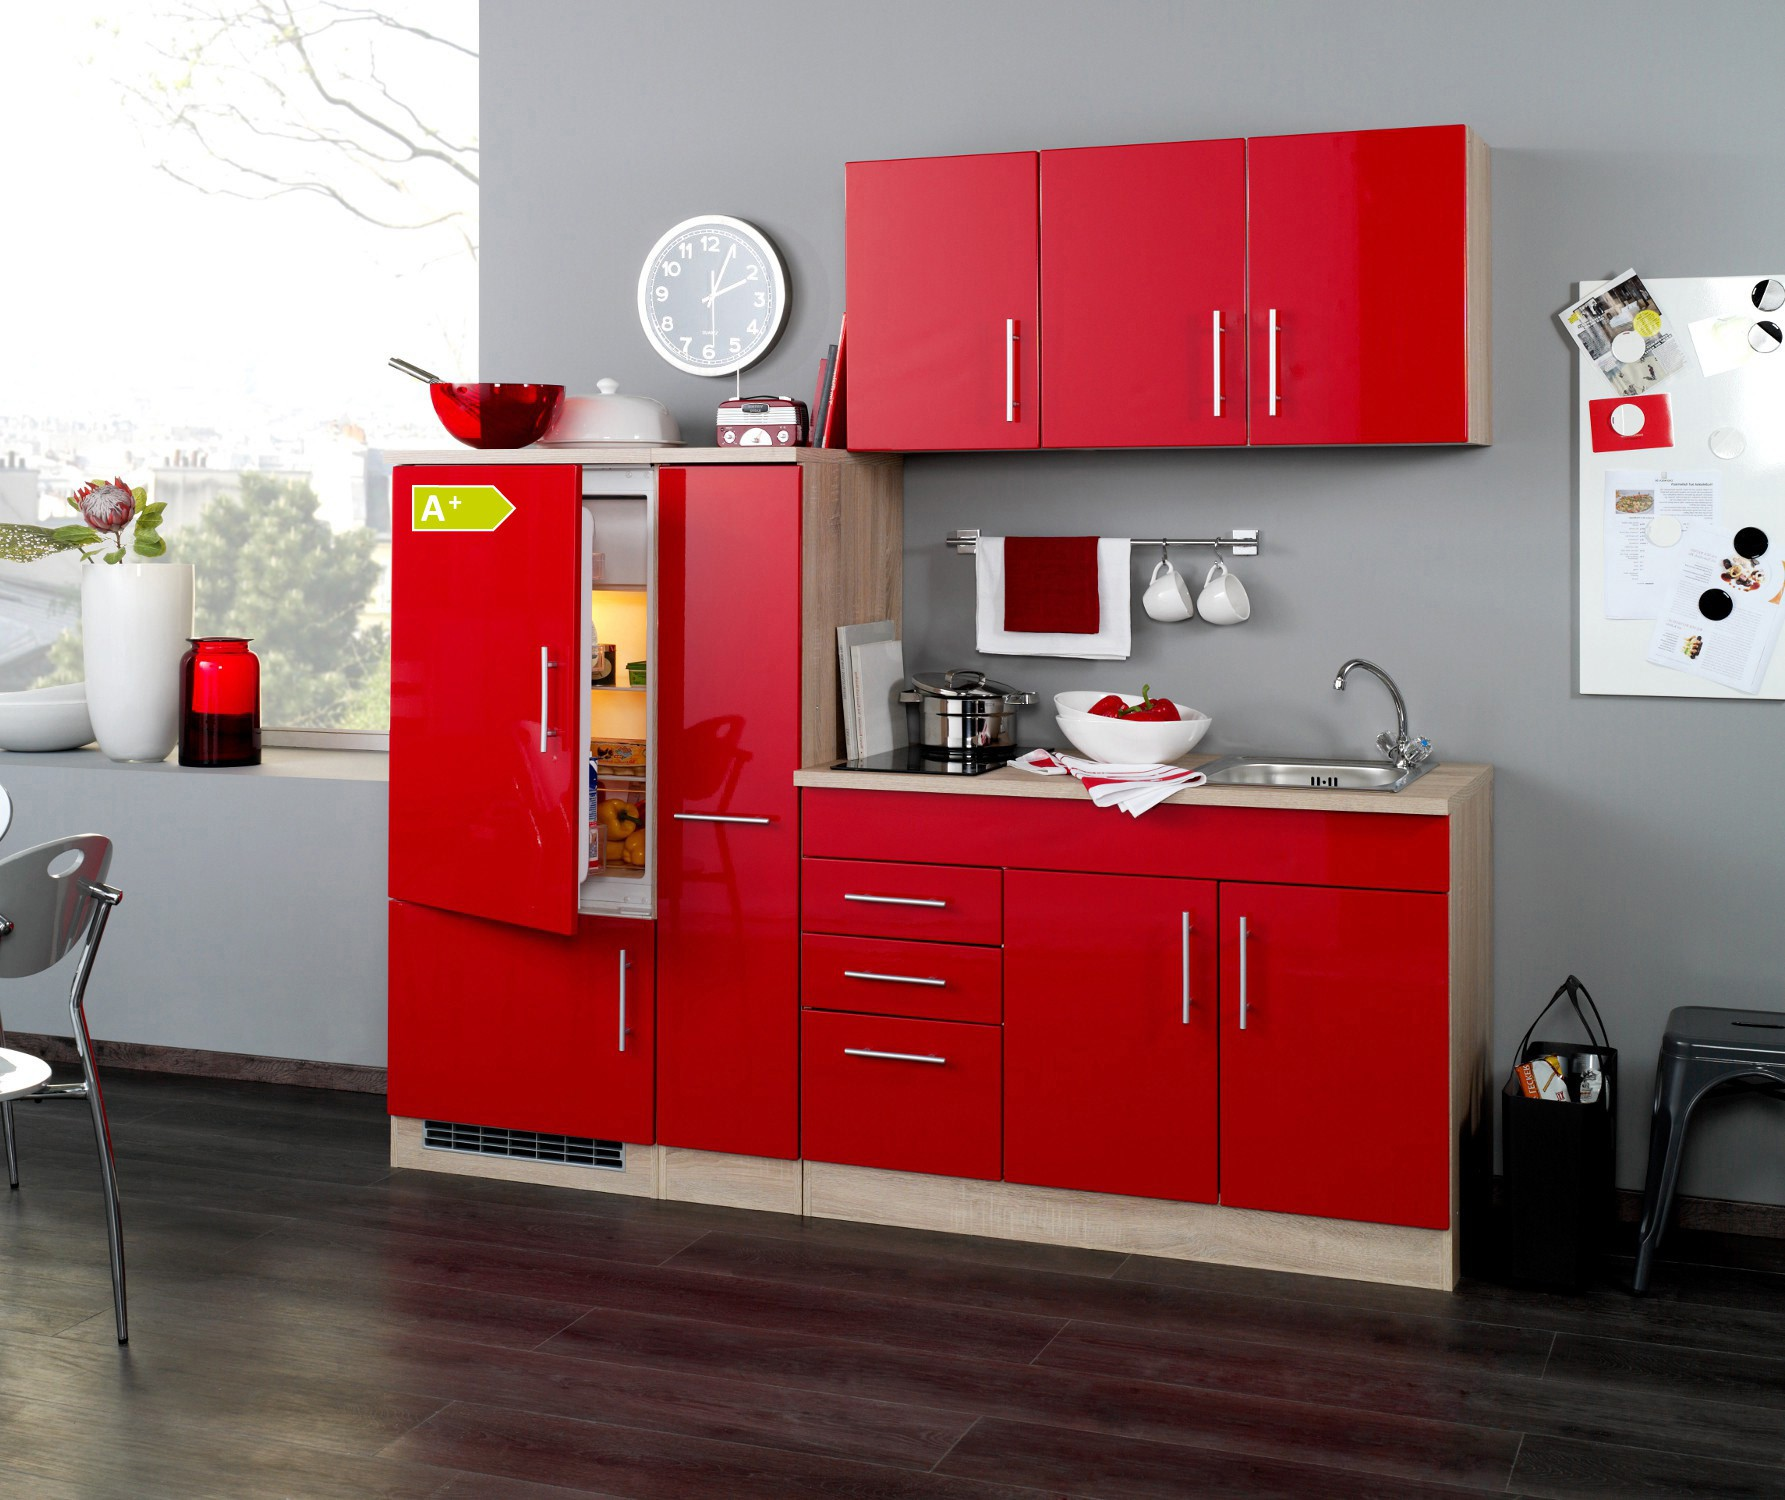 Full Size of Single Küche Spülmaschine Single Küche Zu Verschenken Obi Single Küche Single Küche über Eck Küche Single Küche